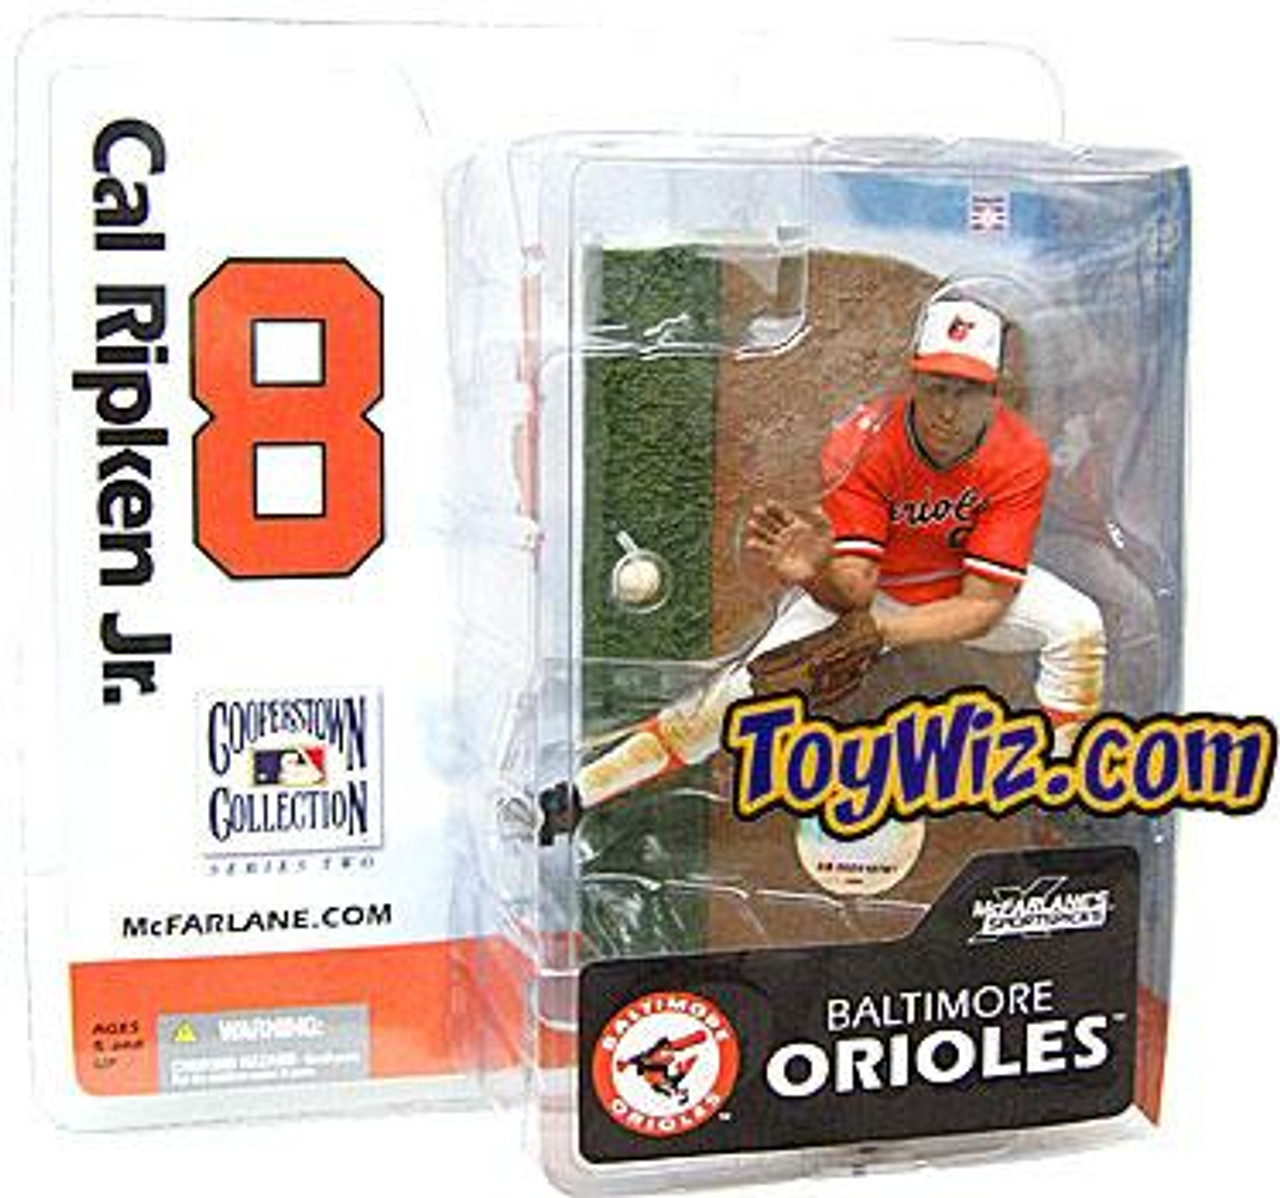 McFarlane Toys MLB Cooperstown Collection Series 2 Cal Ripken Jr. Action Figure [Orange Jersey]